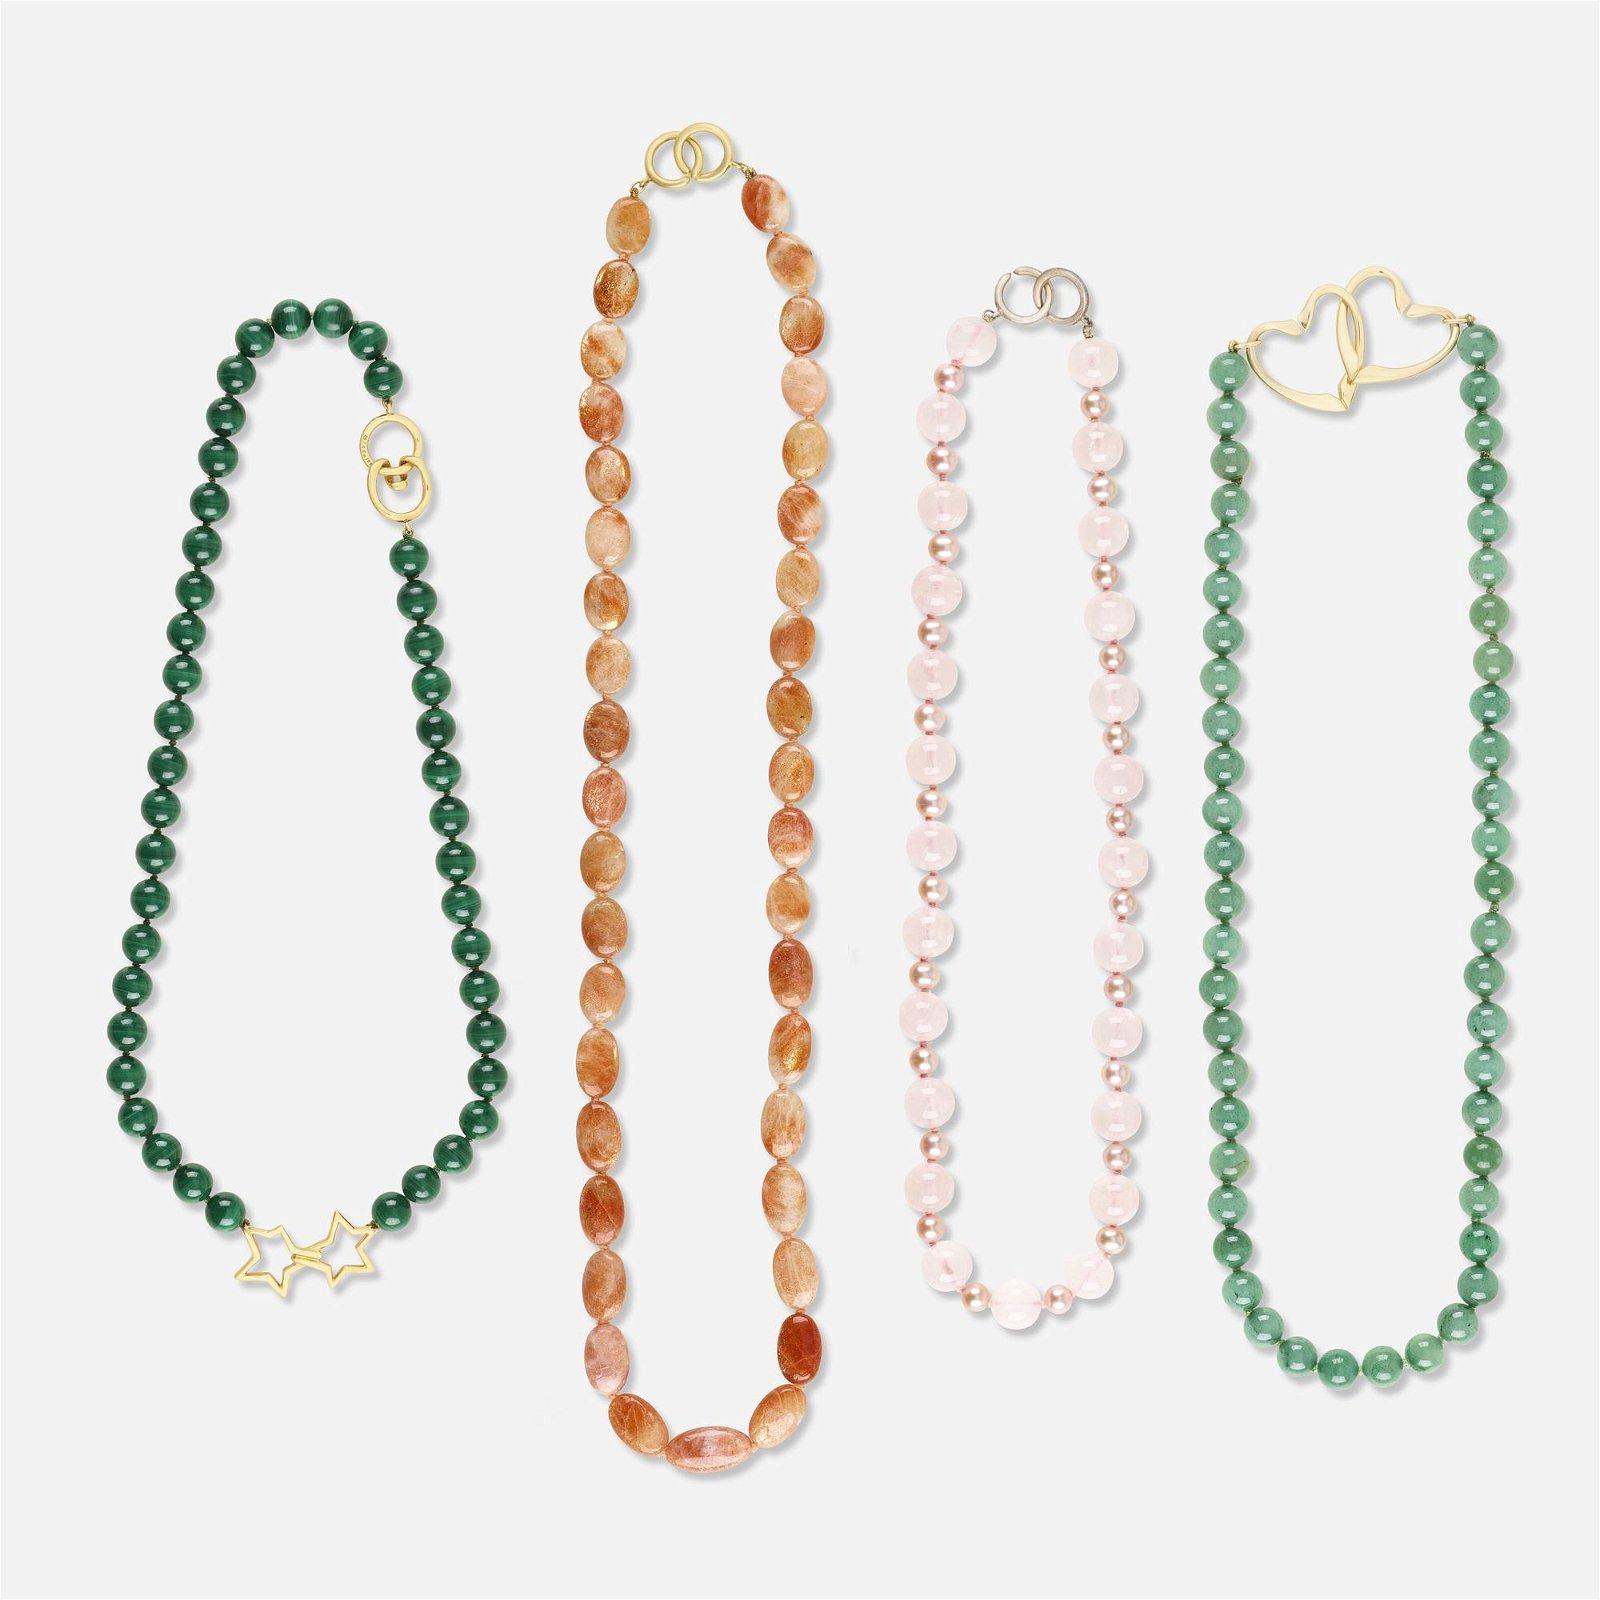 Four gem bead necklaces